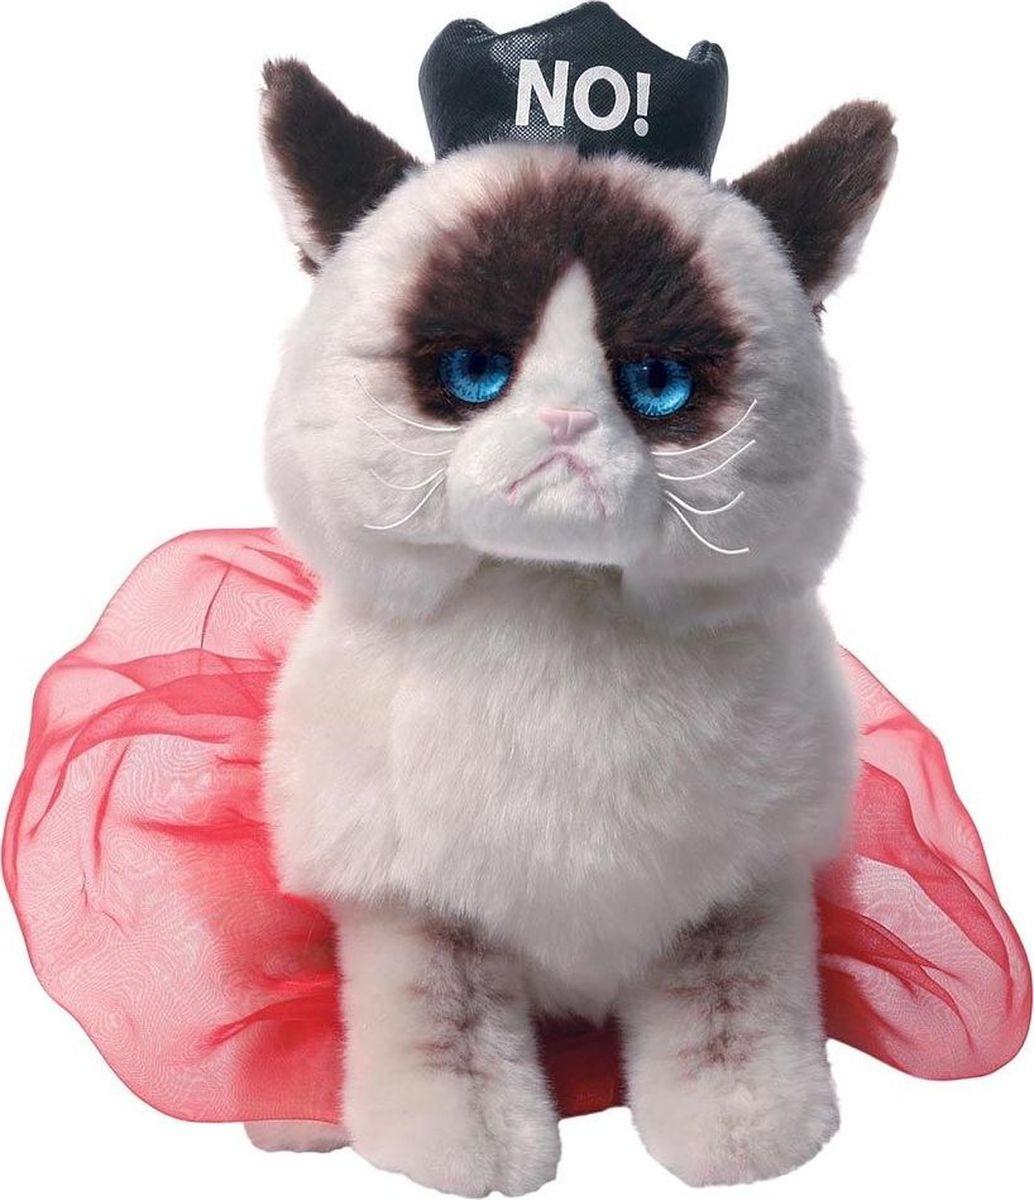 Gund Мягкая игрушка Queen Grumpy Cat 23 см gund мягкая игрушка grumpy cat 23 см